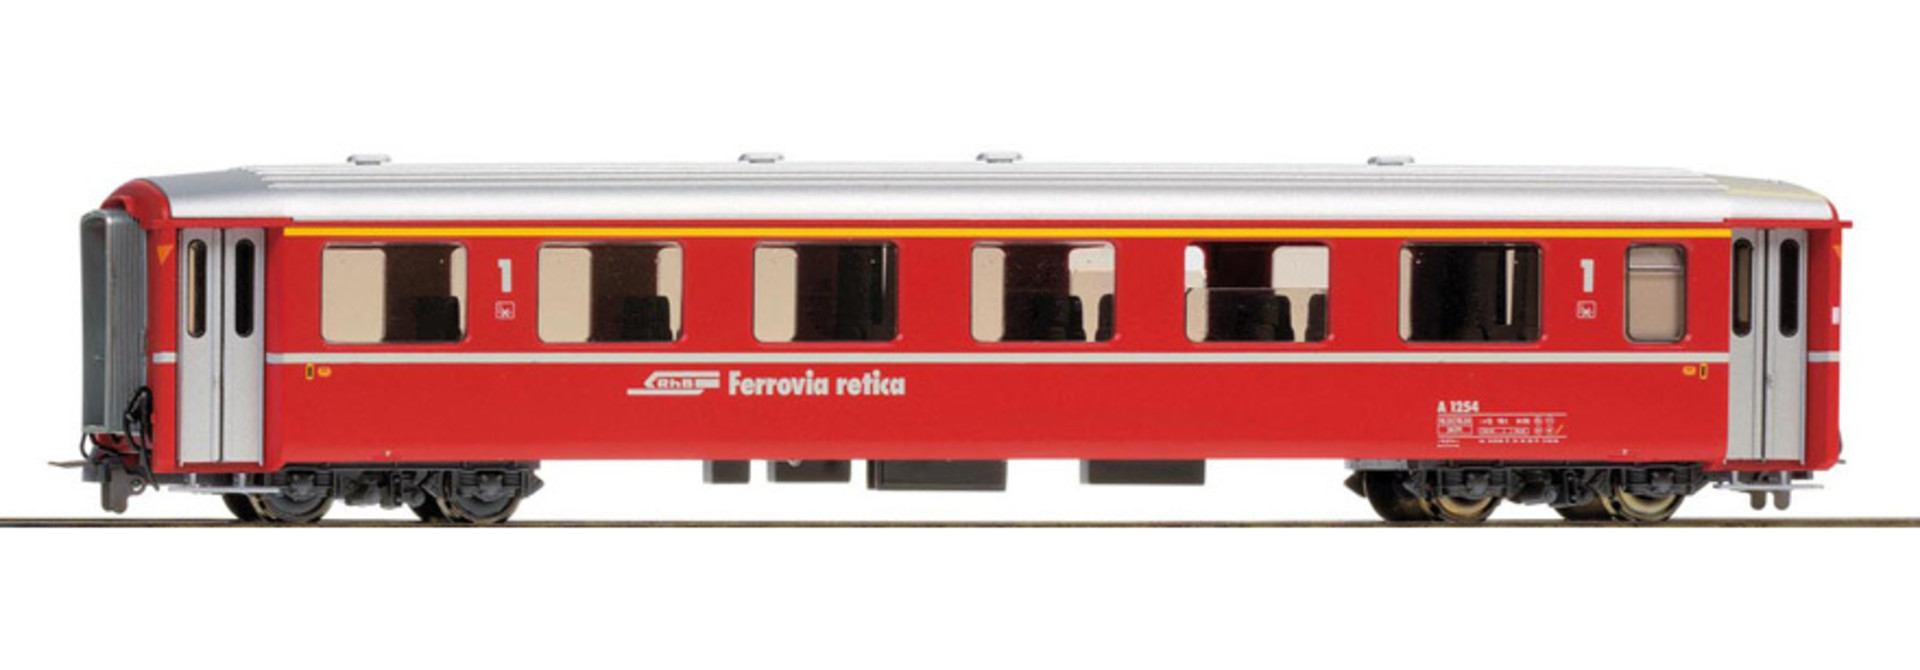 3268154 RhB A 1254 Einheitswagen I